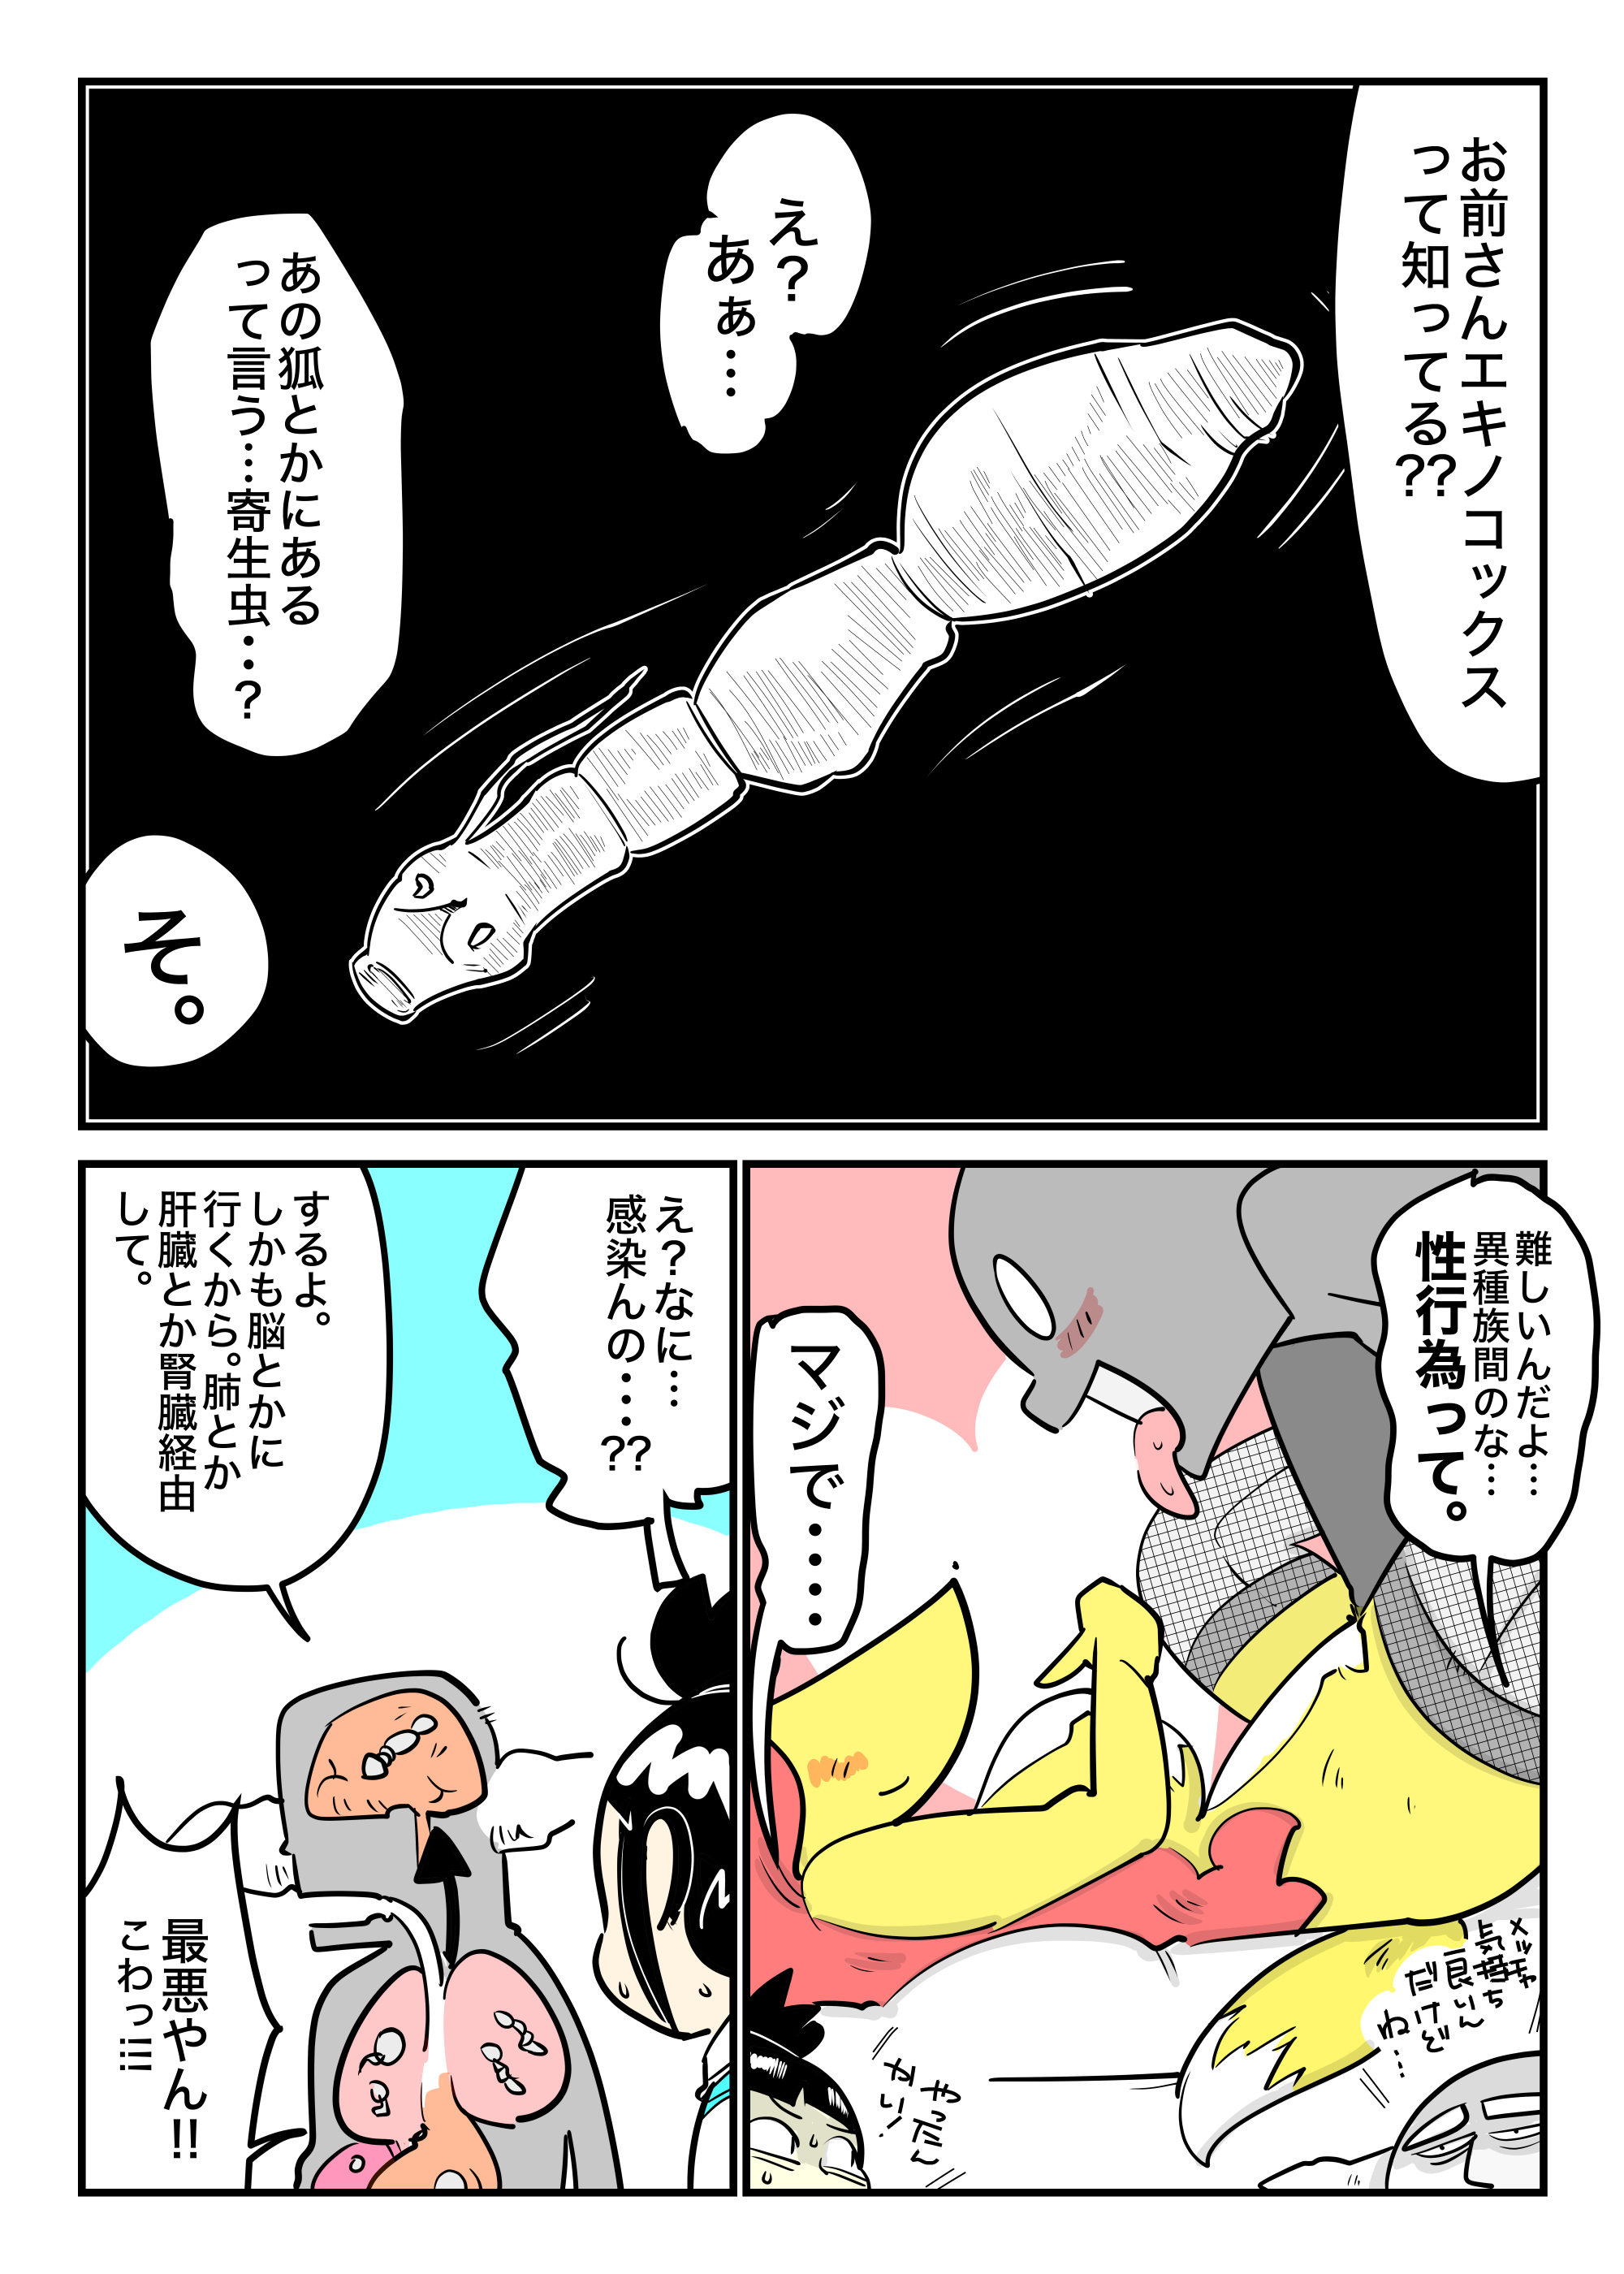 f:id:terashimaru117:20210914000415p:plain